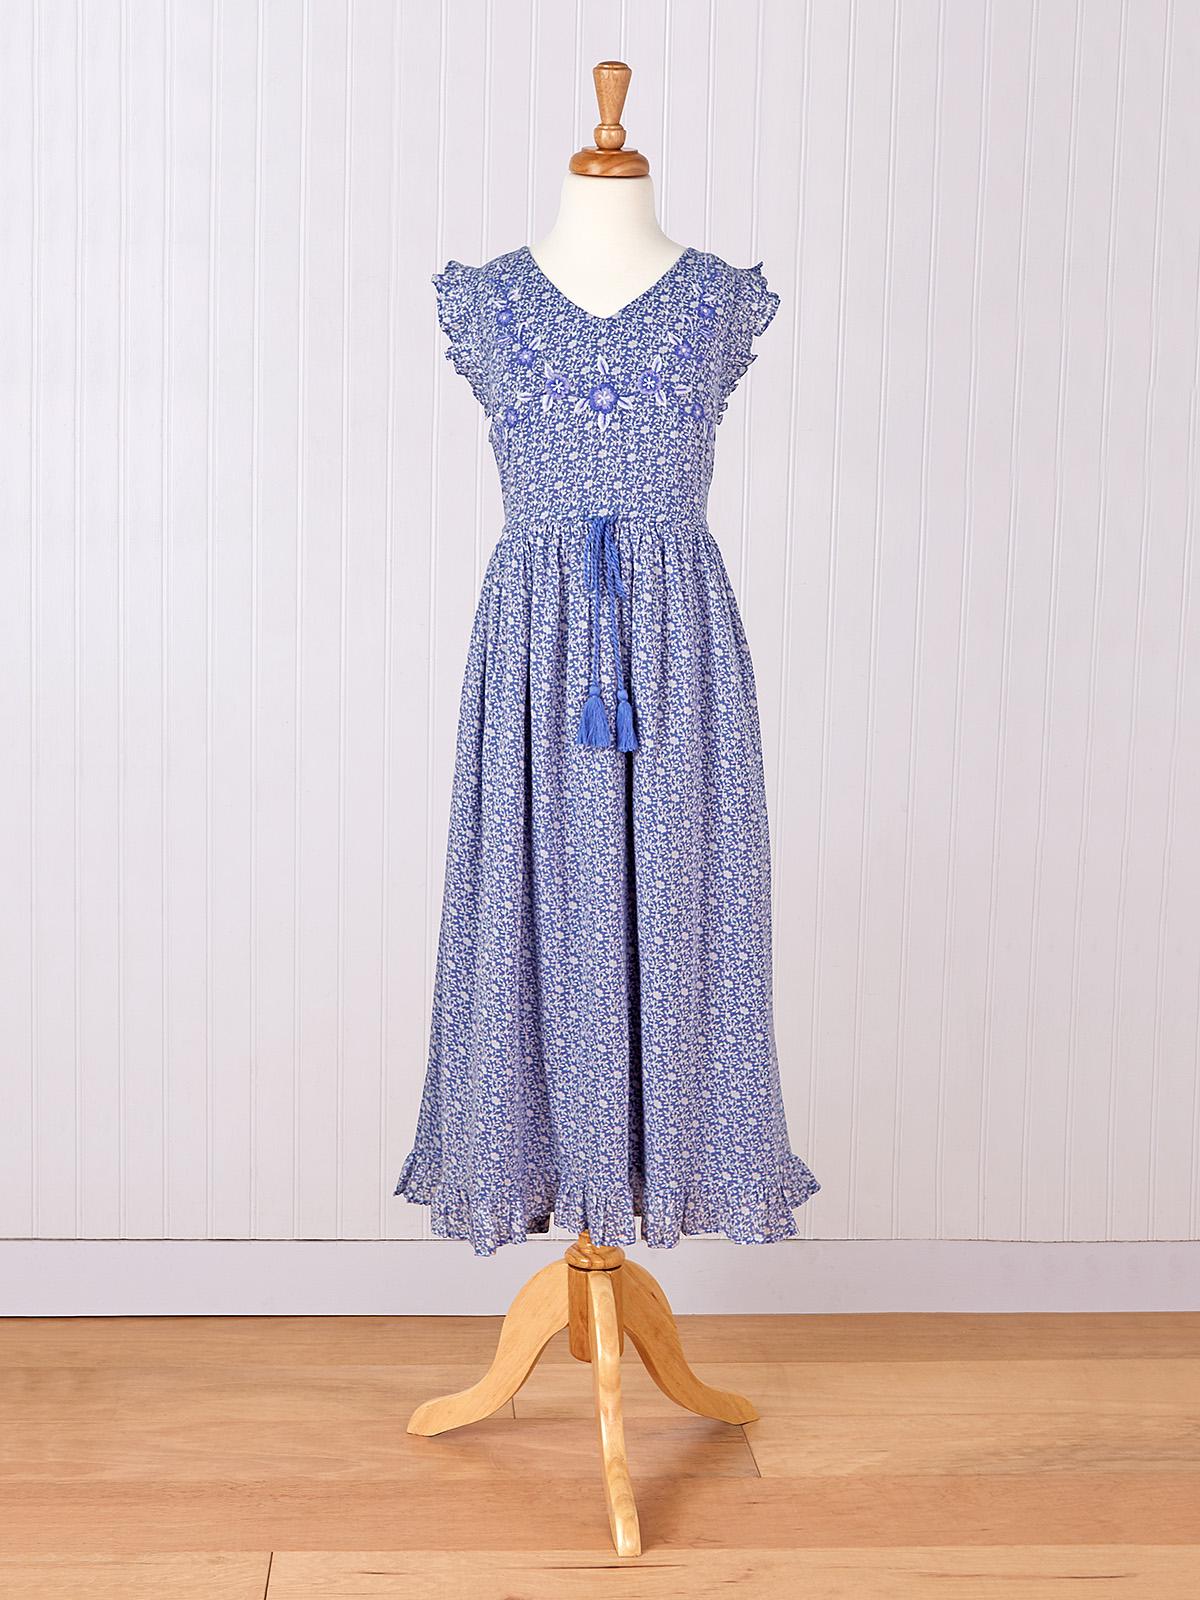 Ashley Young Lady Dress